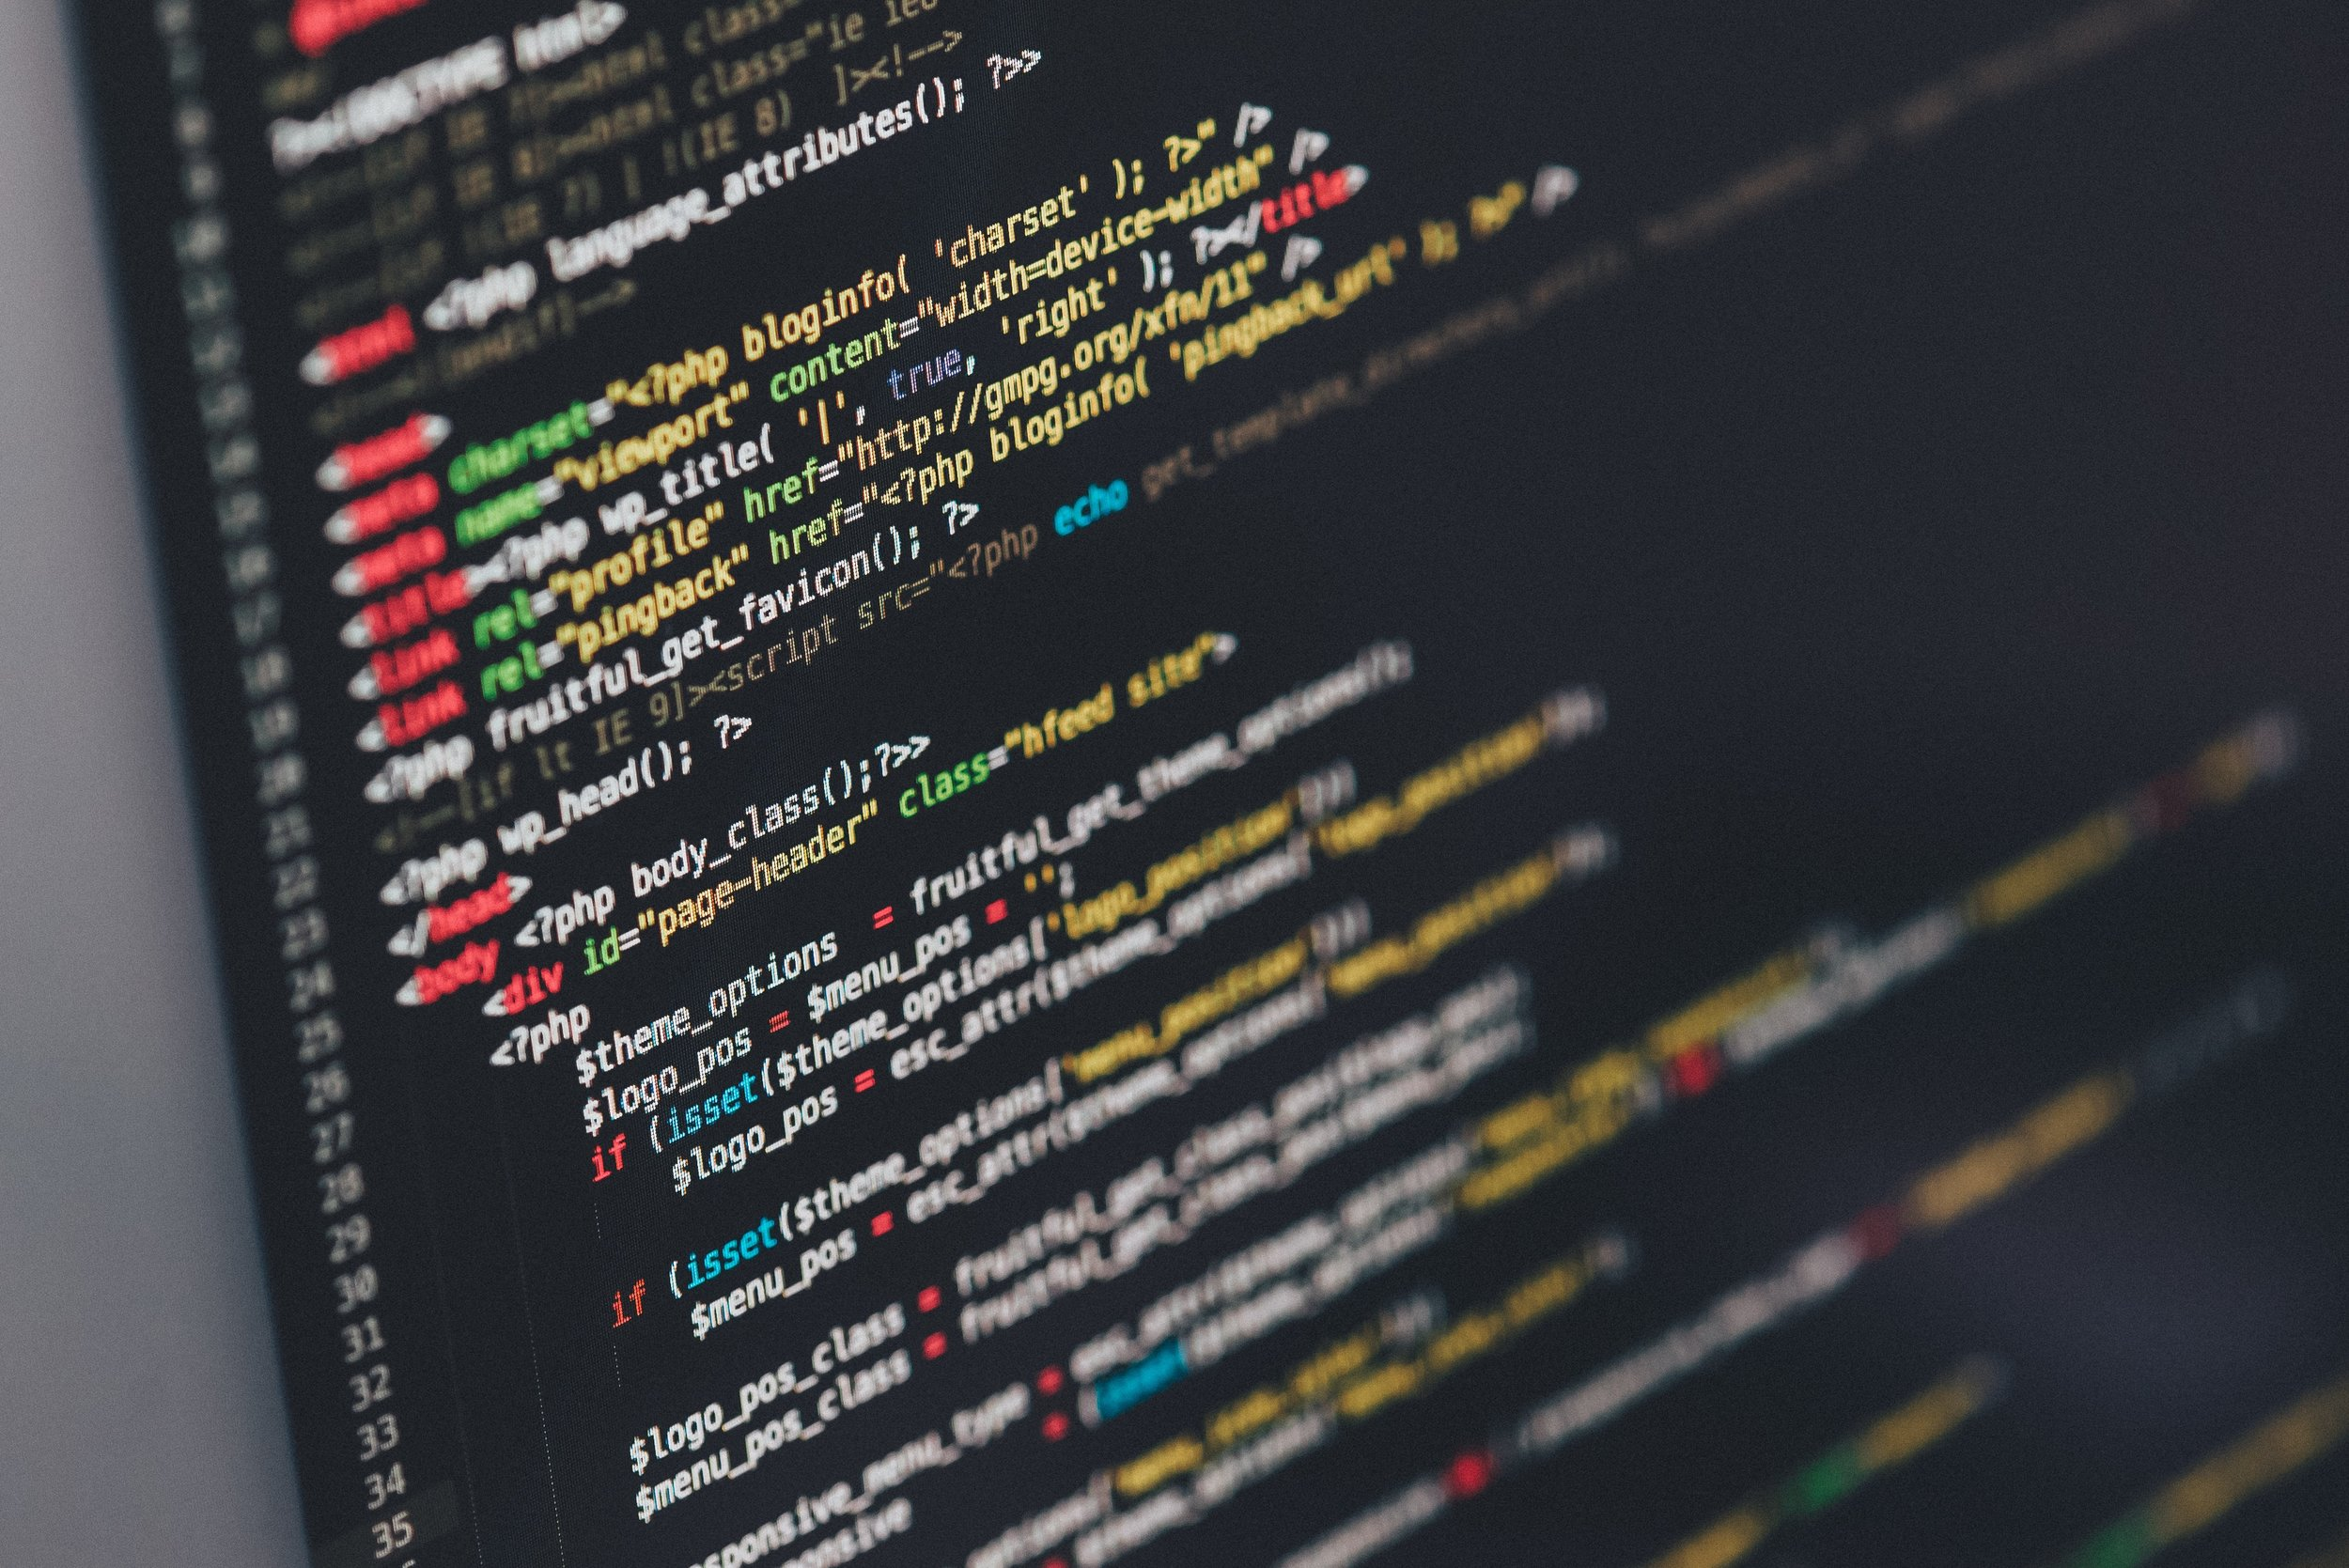 Symantec's Website Security Threat Report 2016